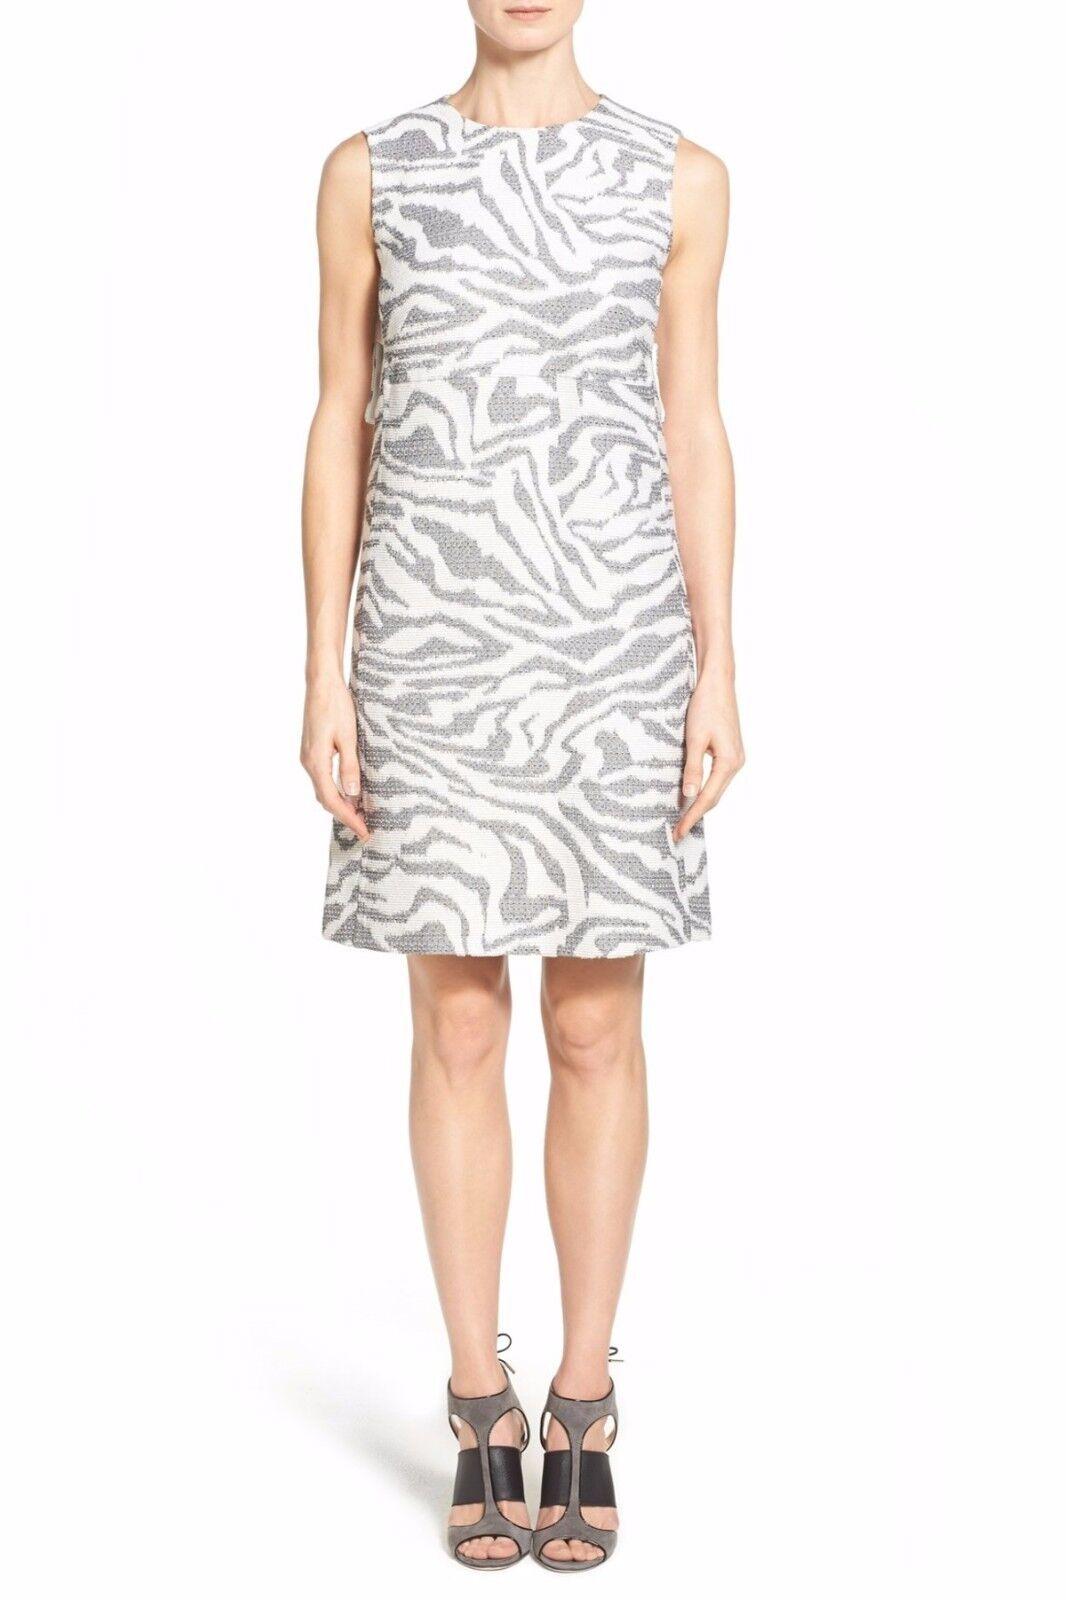 HUGO BOSS Dakola Zebra Pattern Sleeveless Dress Größe 2 NWT